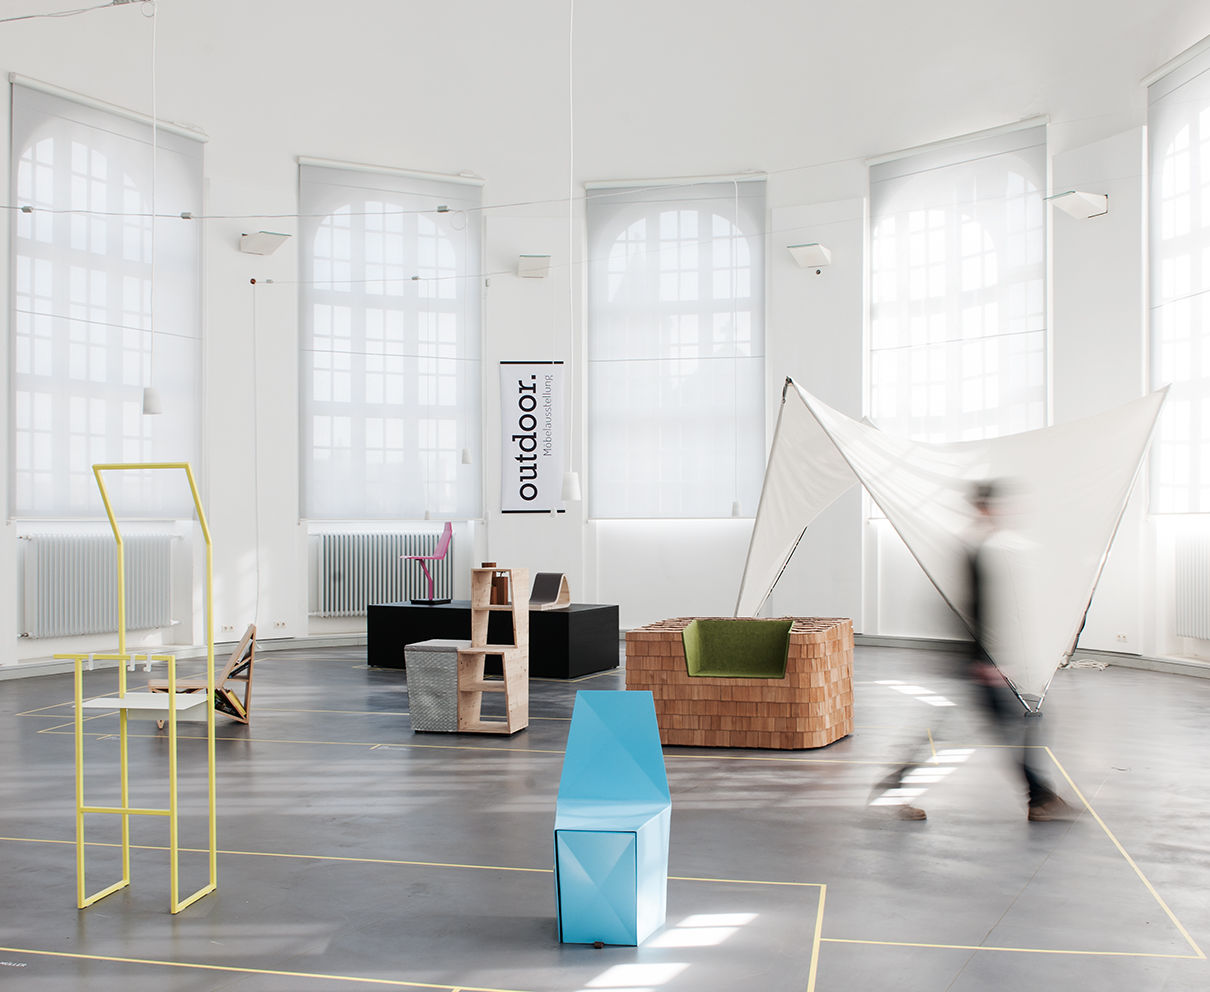 field of study: interior design